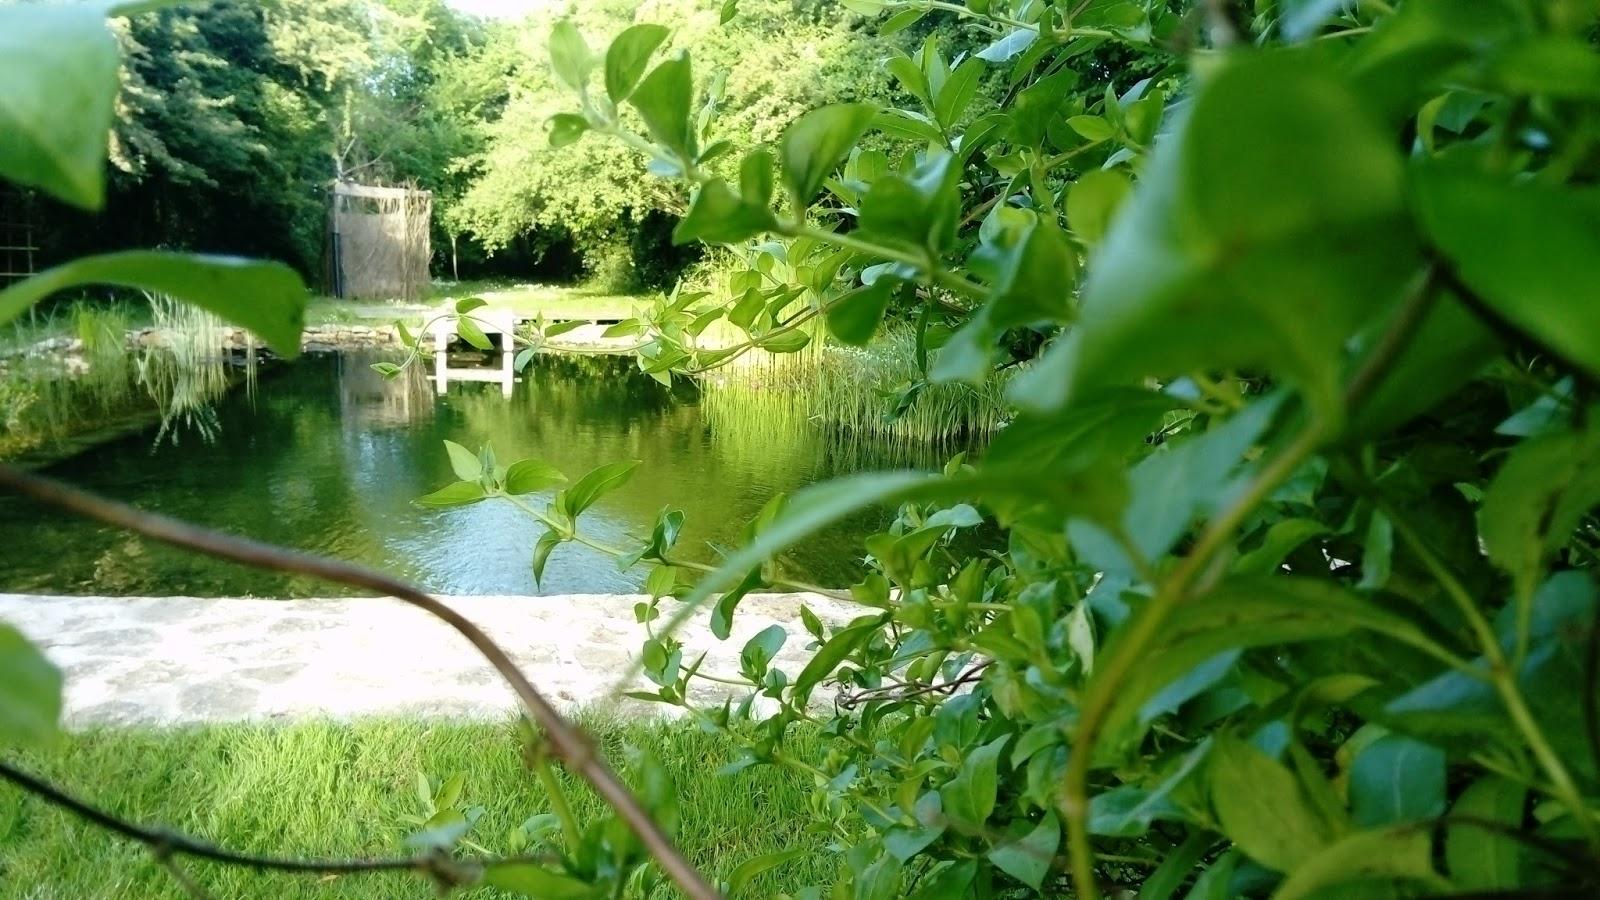 Bassin De Baignade Autoconstruction bassin de baignade naturelle en autoconstruction: printemps 2017